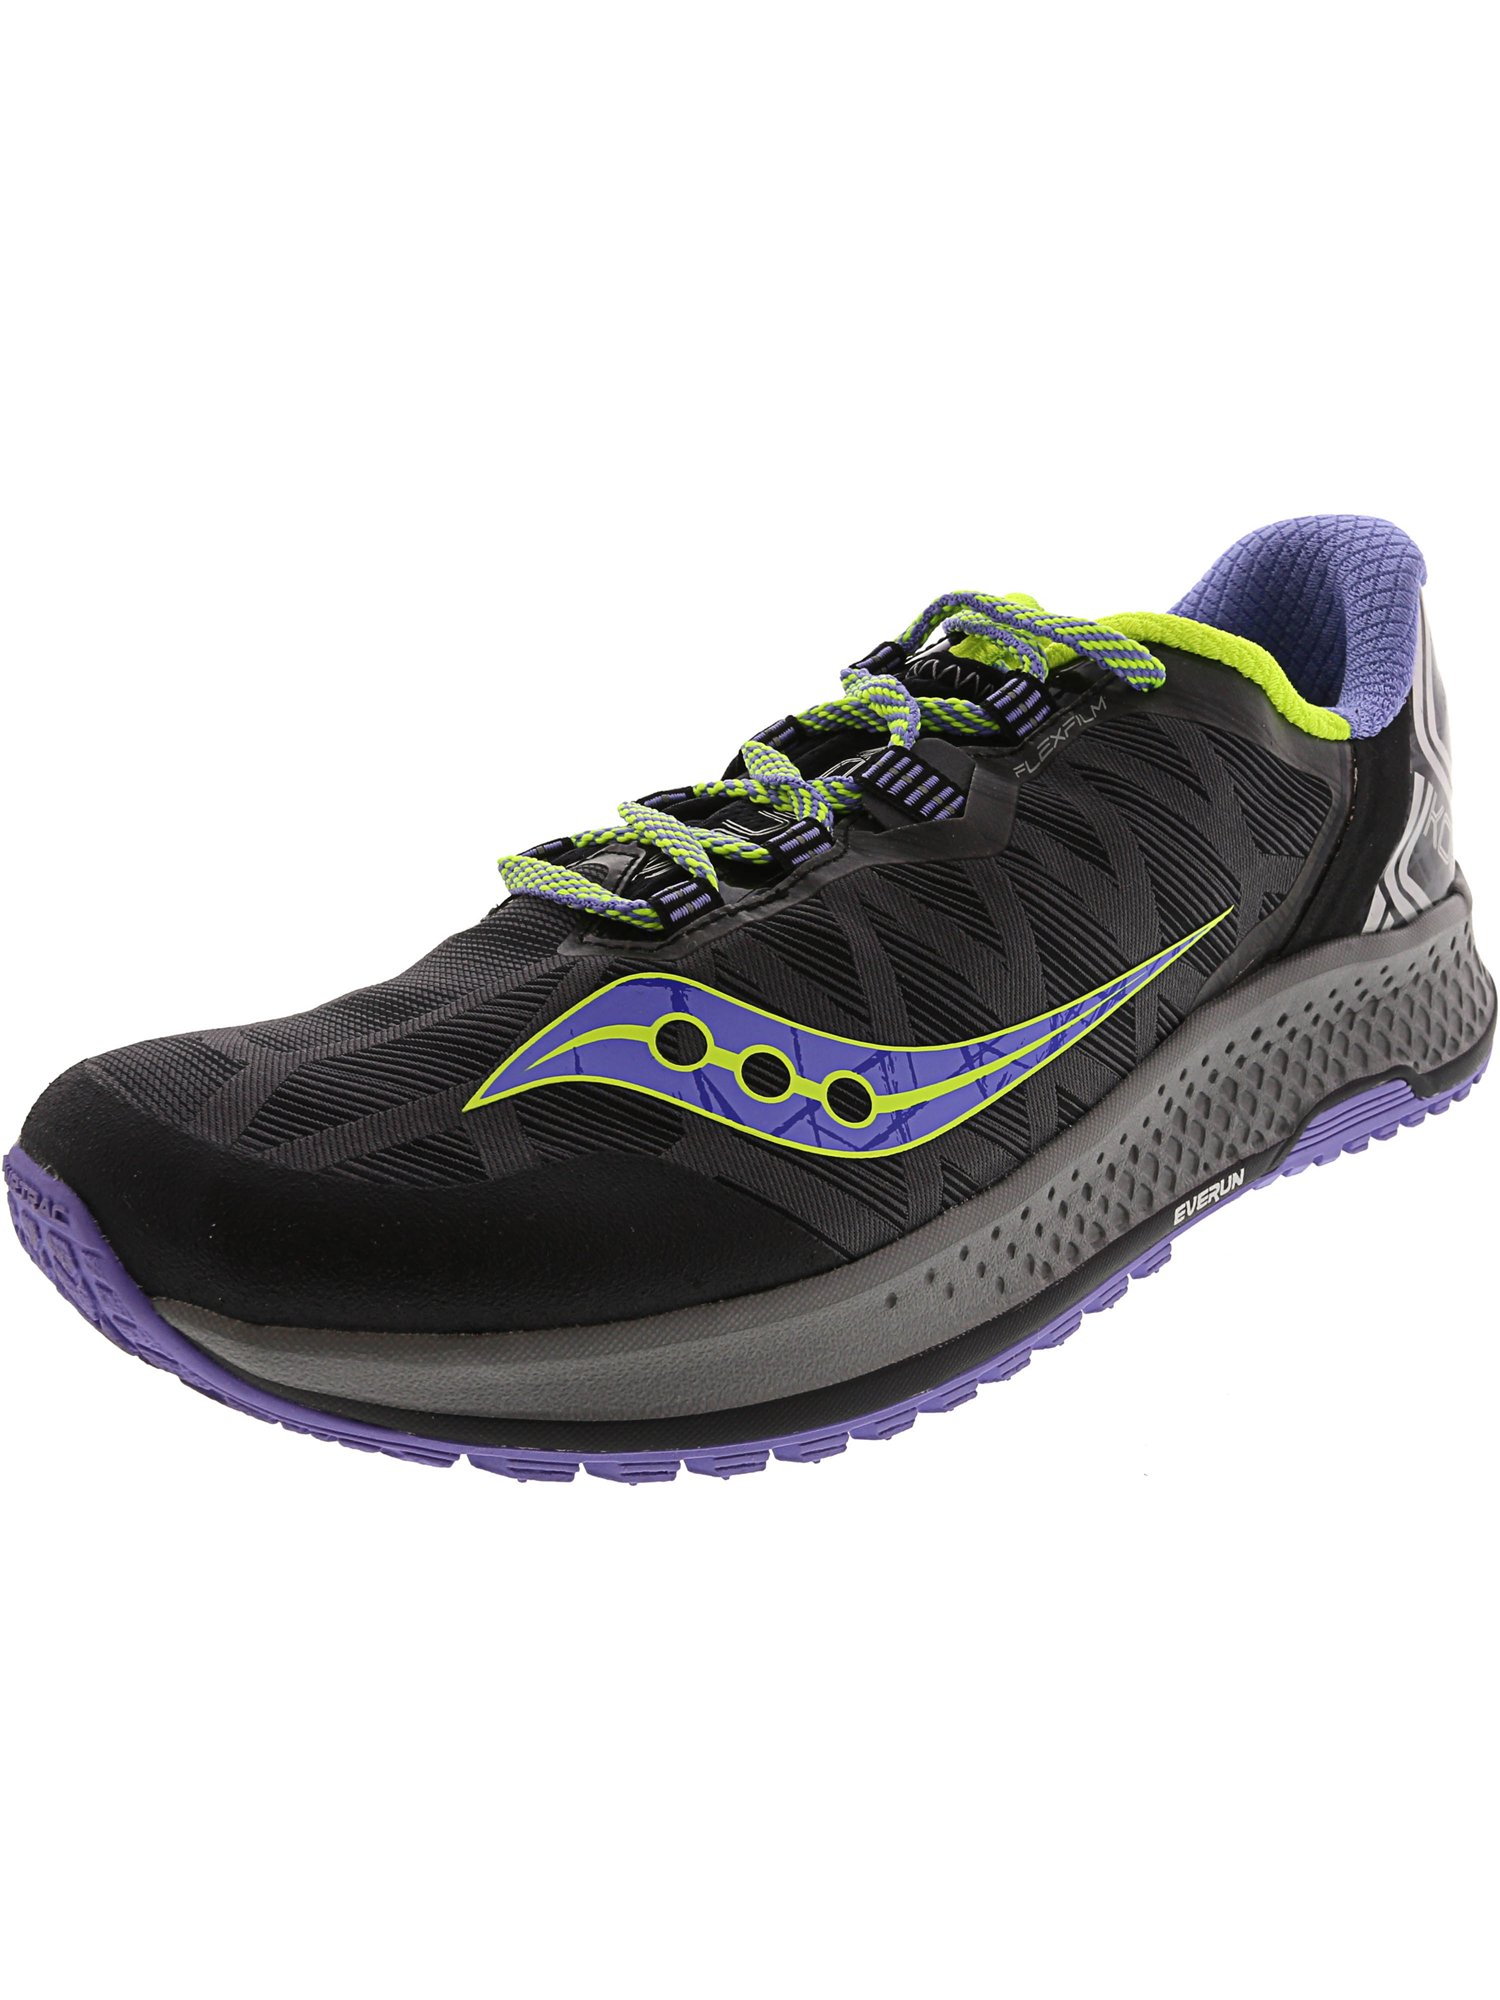 Saucony Women's Koa Tr Grey / Blue Cotton Ankle-High Running Shoe - 11.5M